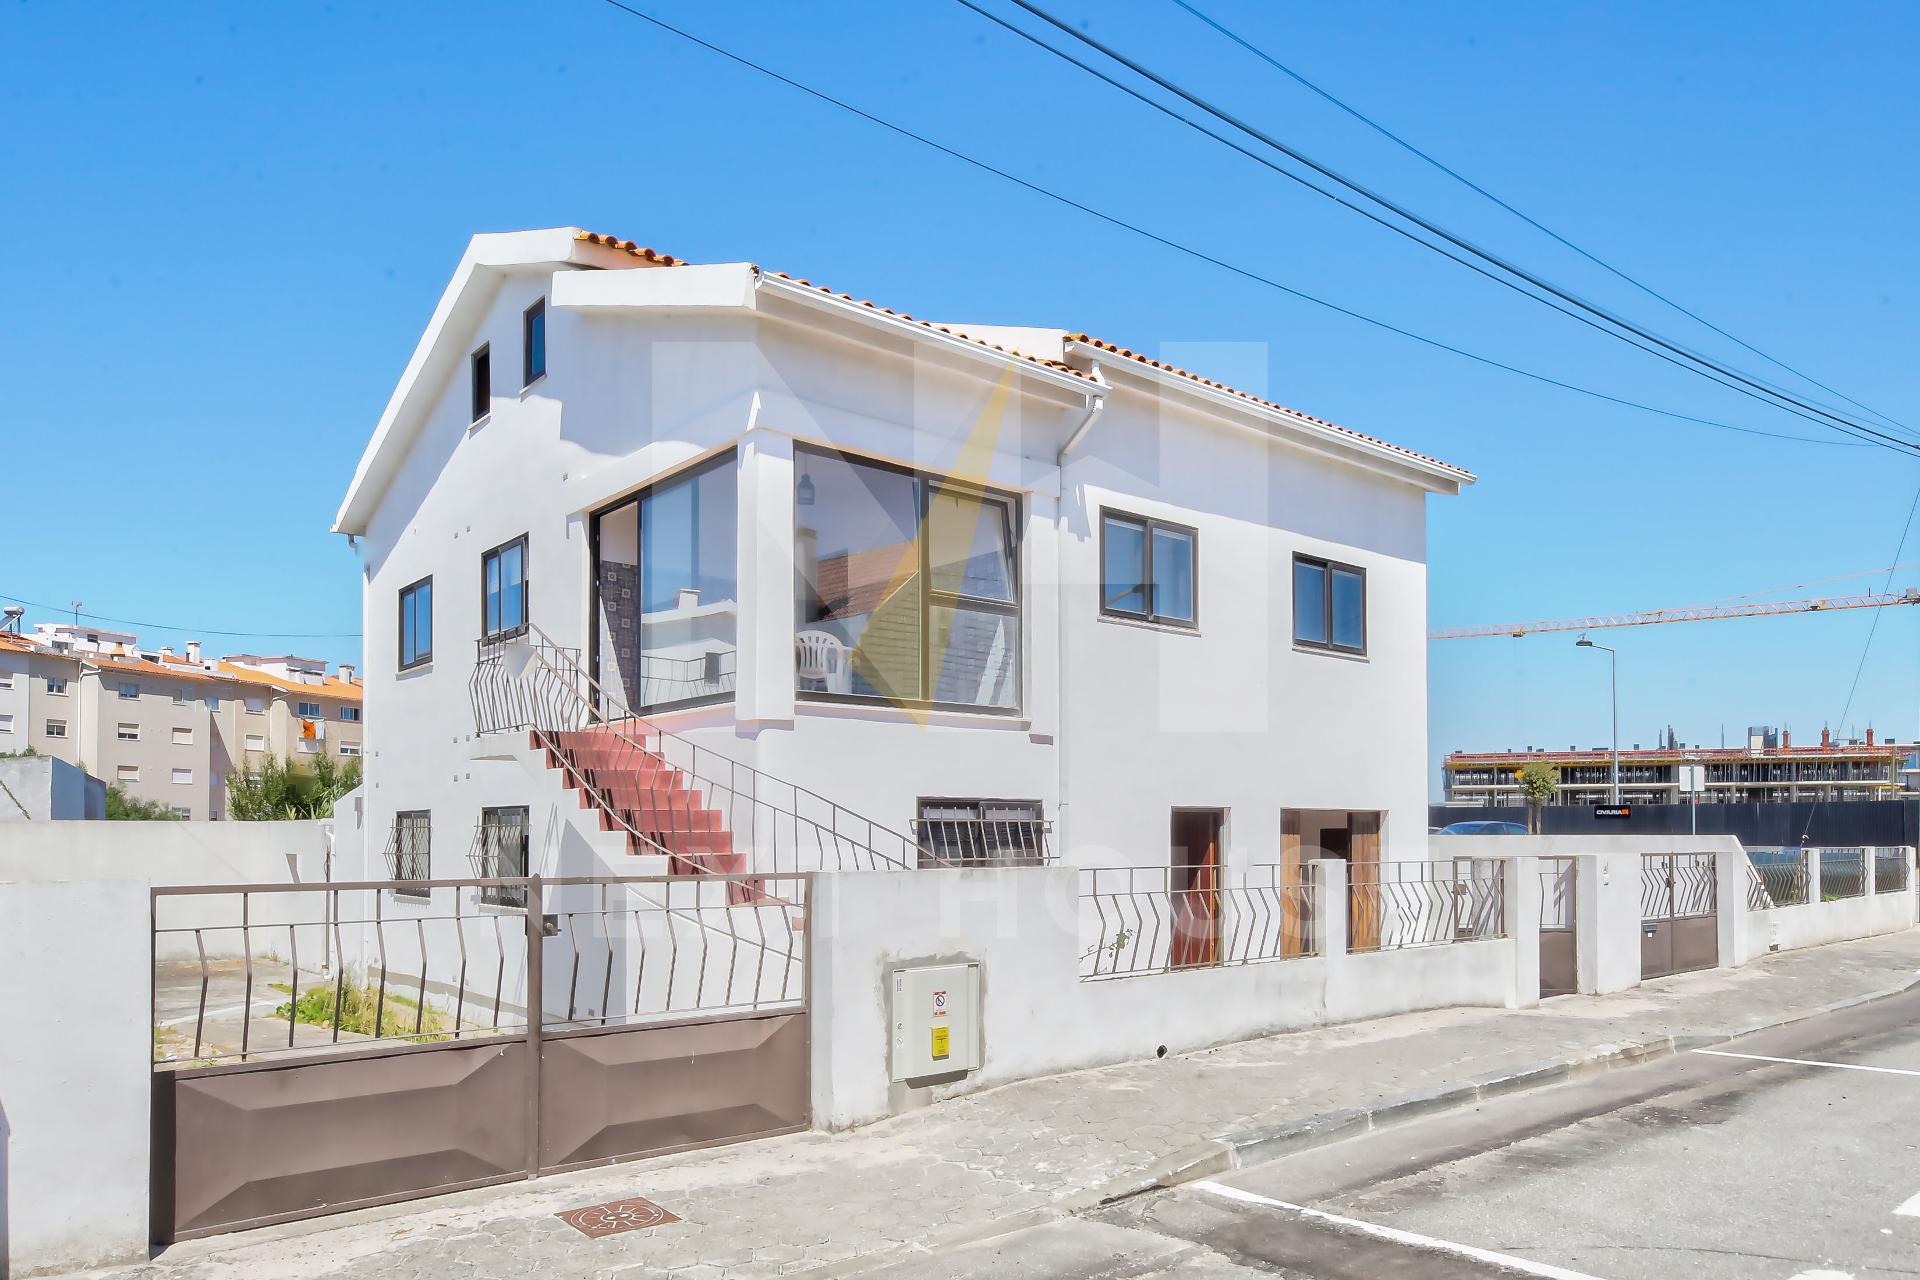 T5_garagem_jardim_Praia da Barra  - Ílhavo, Gafanha Da Nazaré